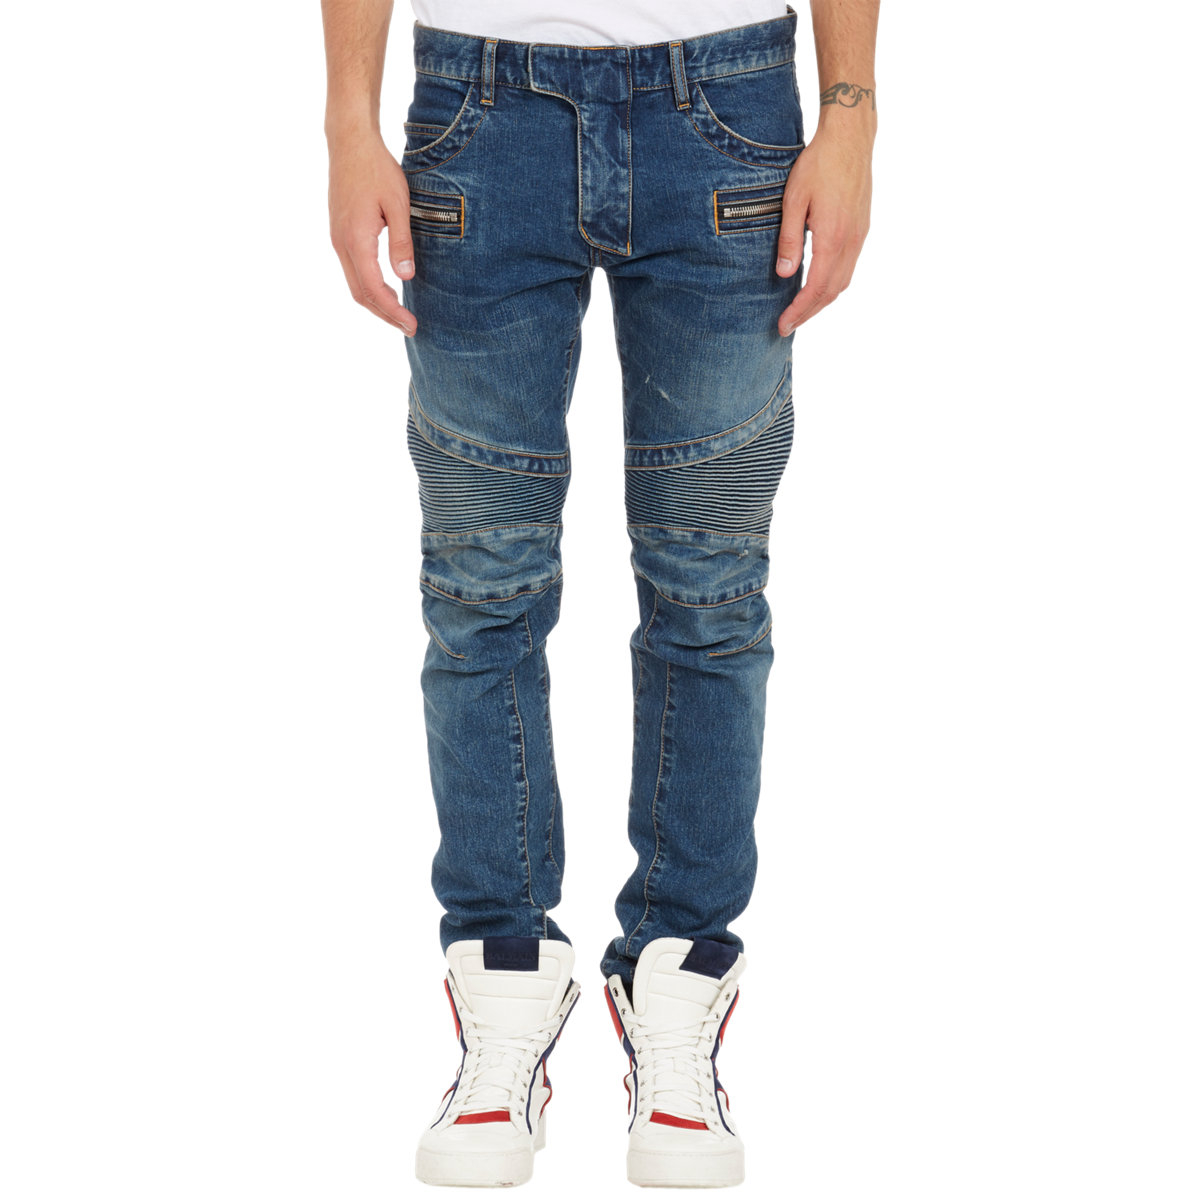 Balmain Denim Moto Jeans-Blue Size 31 In Blue For Men | Lyst